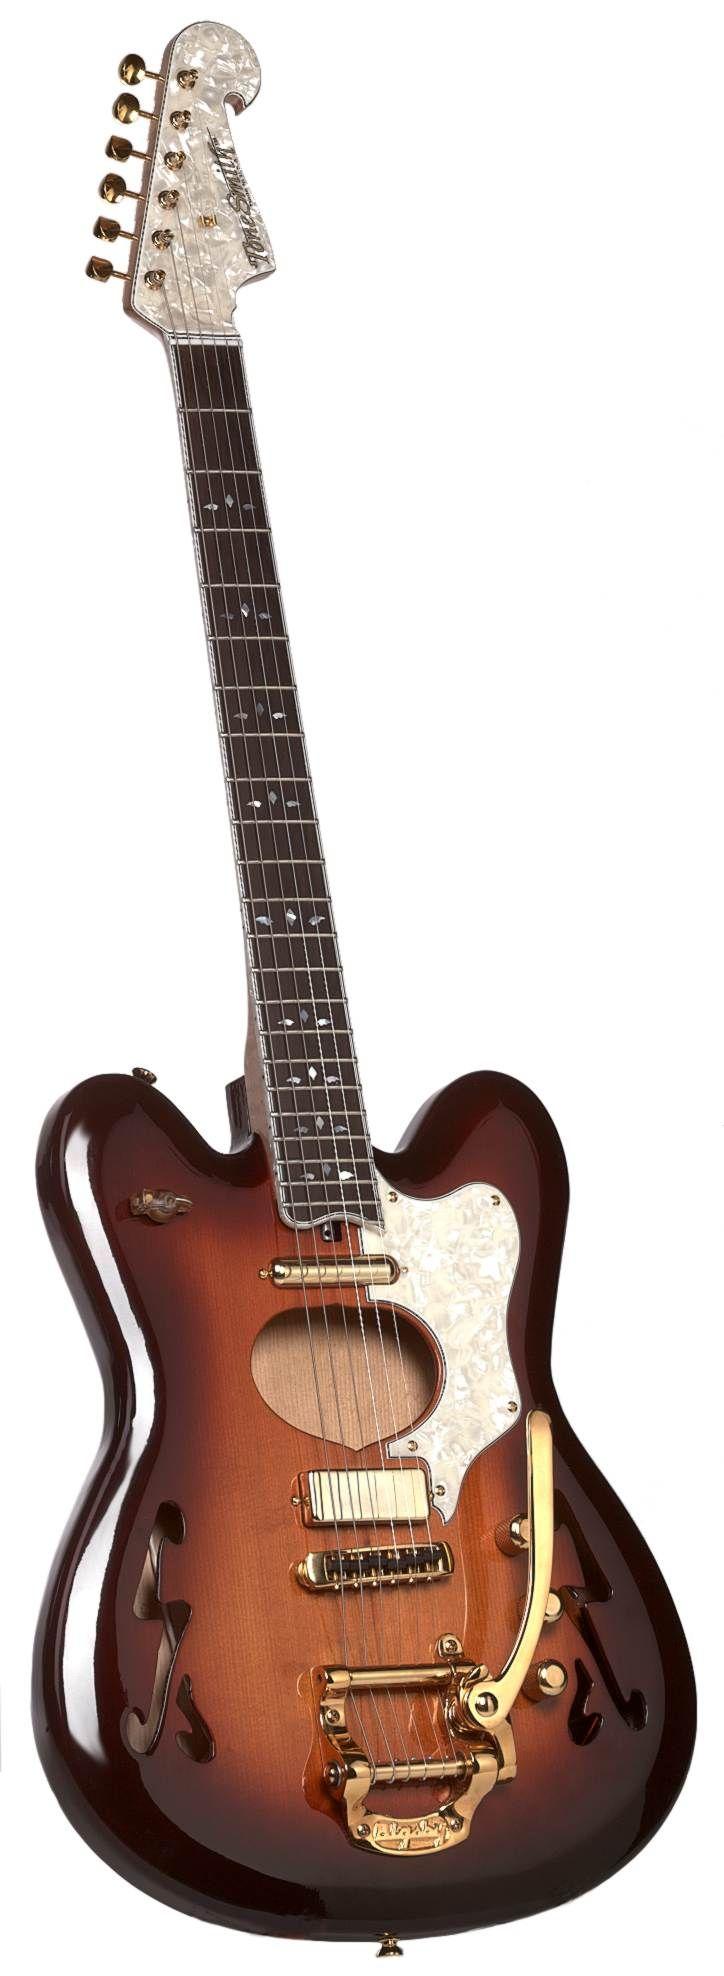 ToneSmith Guitars 320 Ac-El